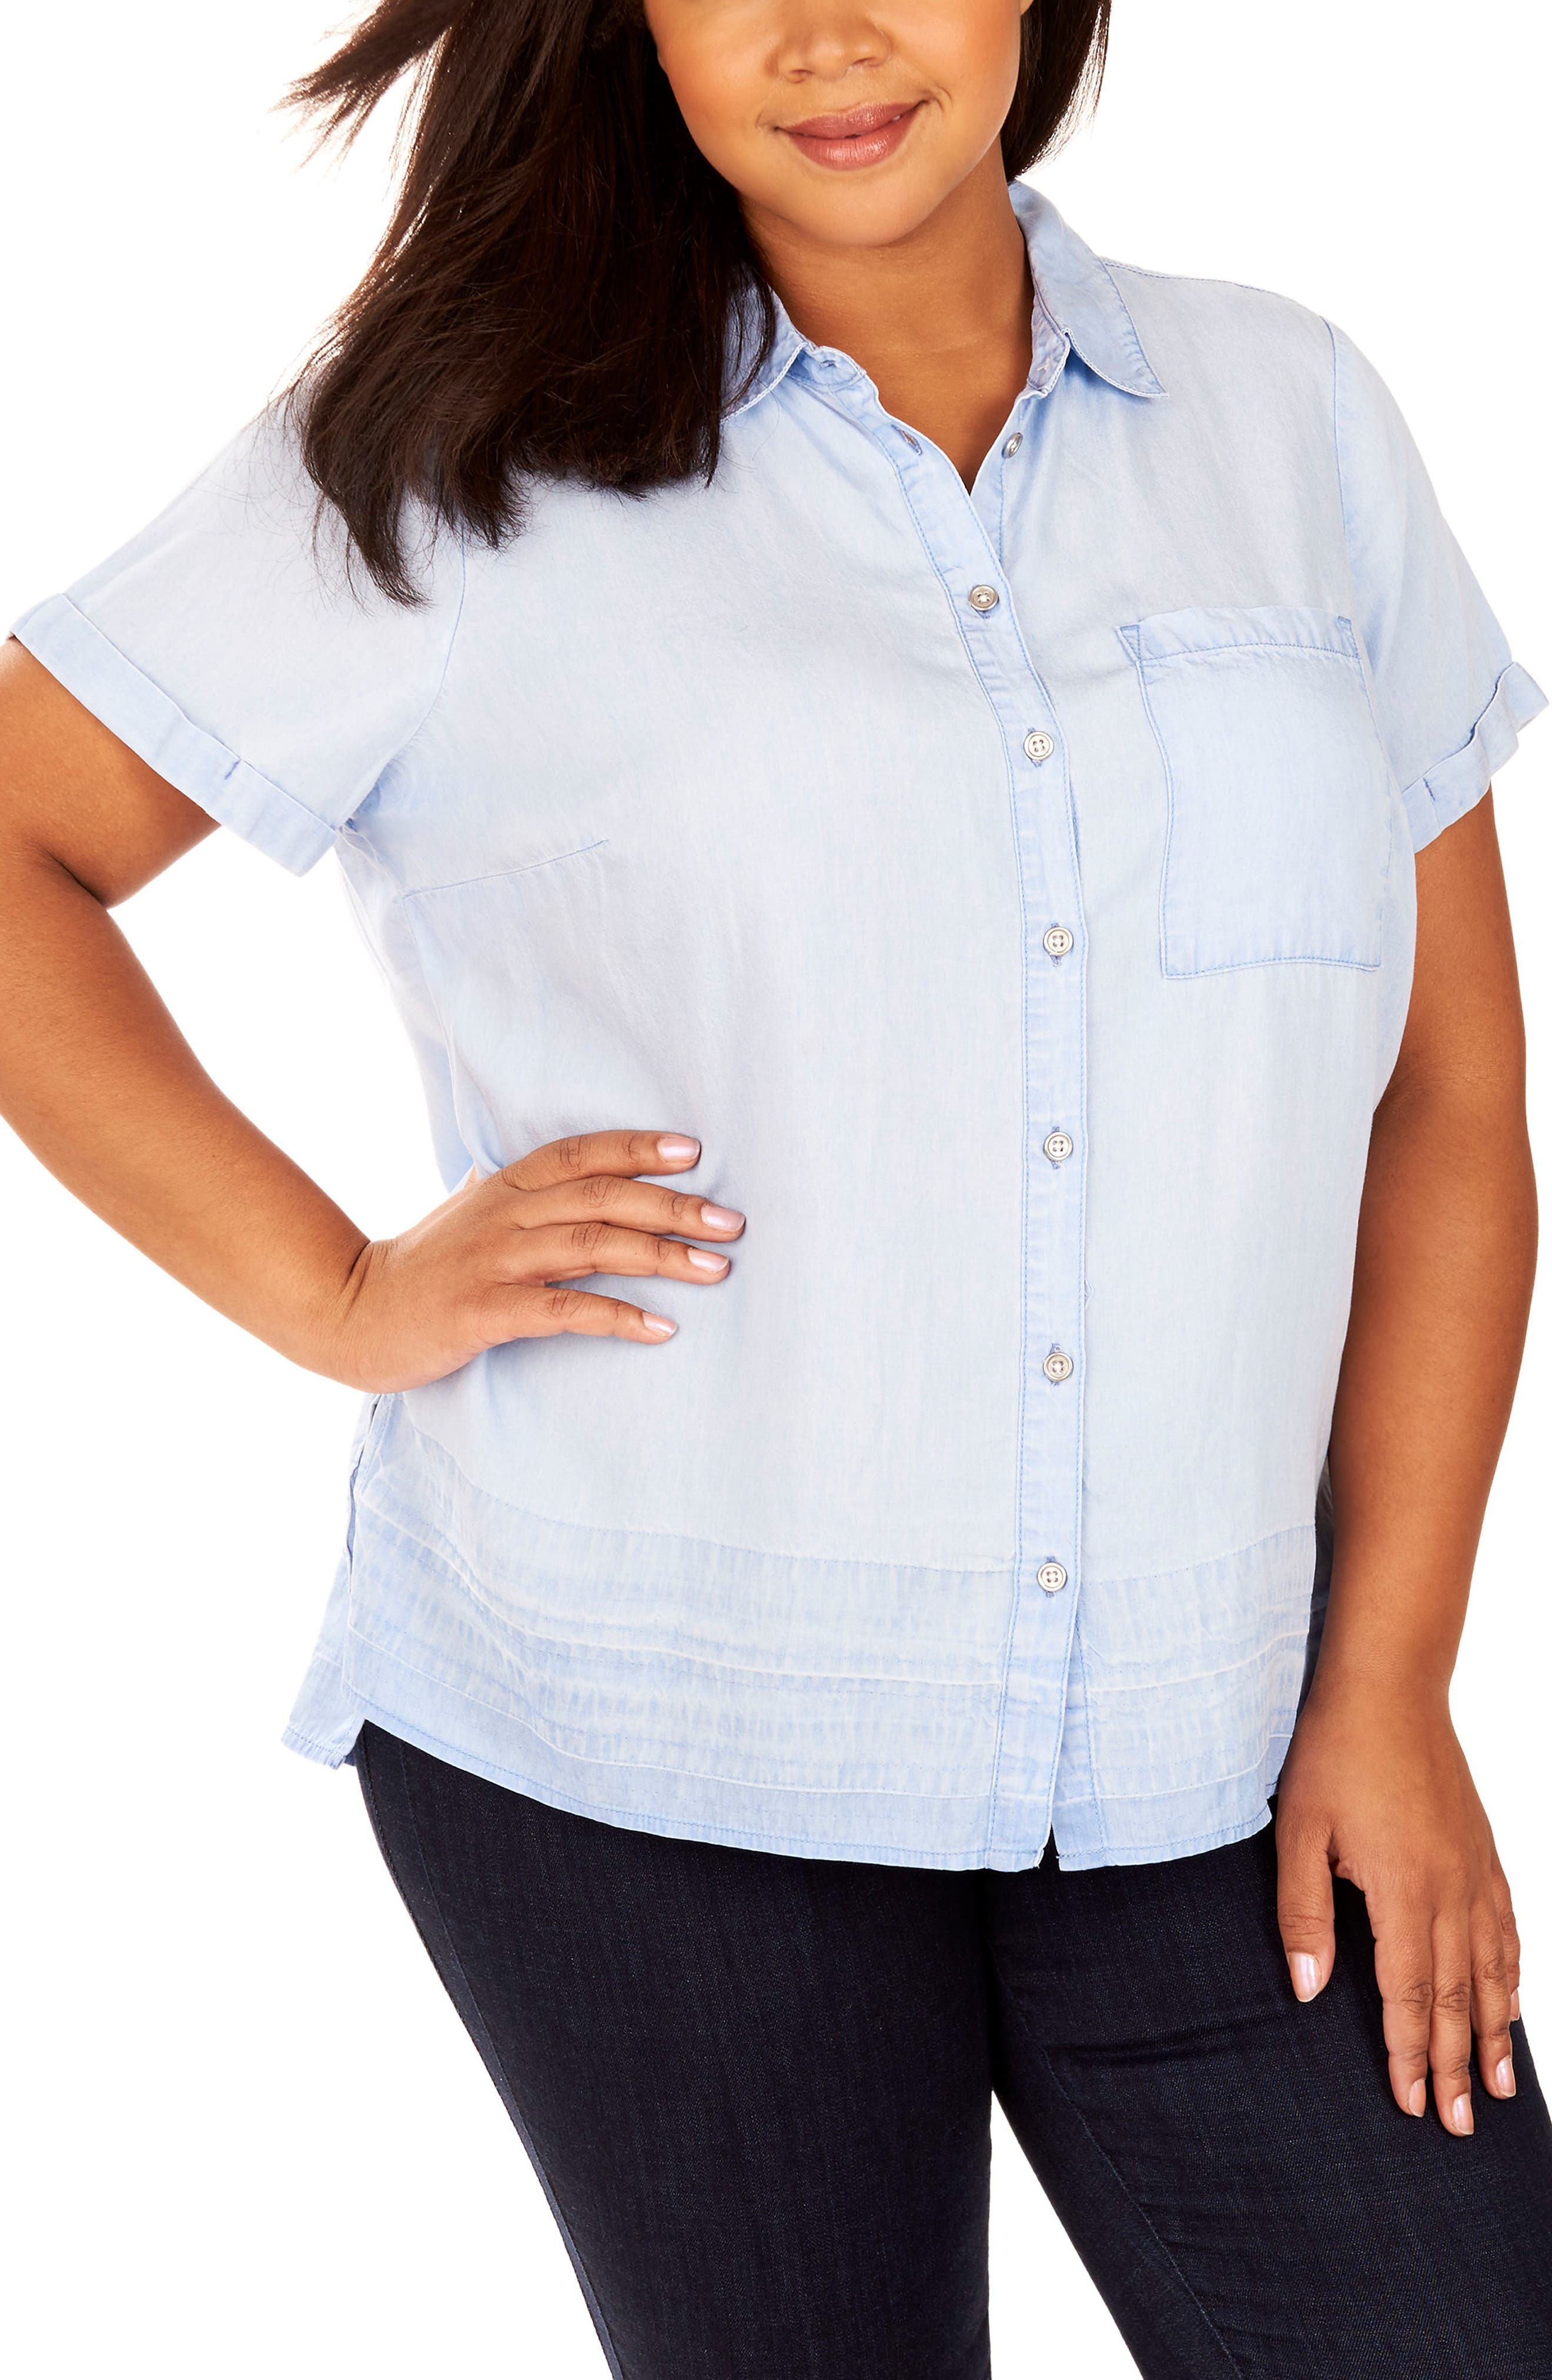 Rebel Wilson x Angels Button Up Collar Shirt (Plus Size)